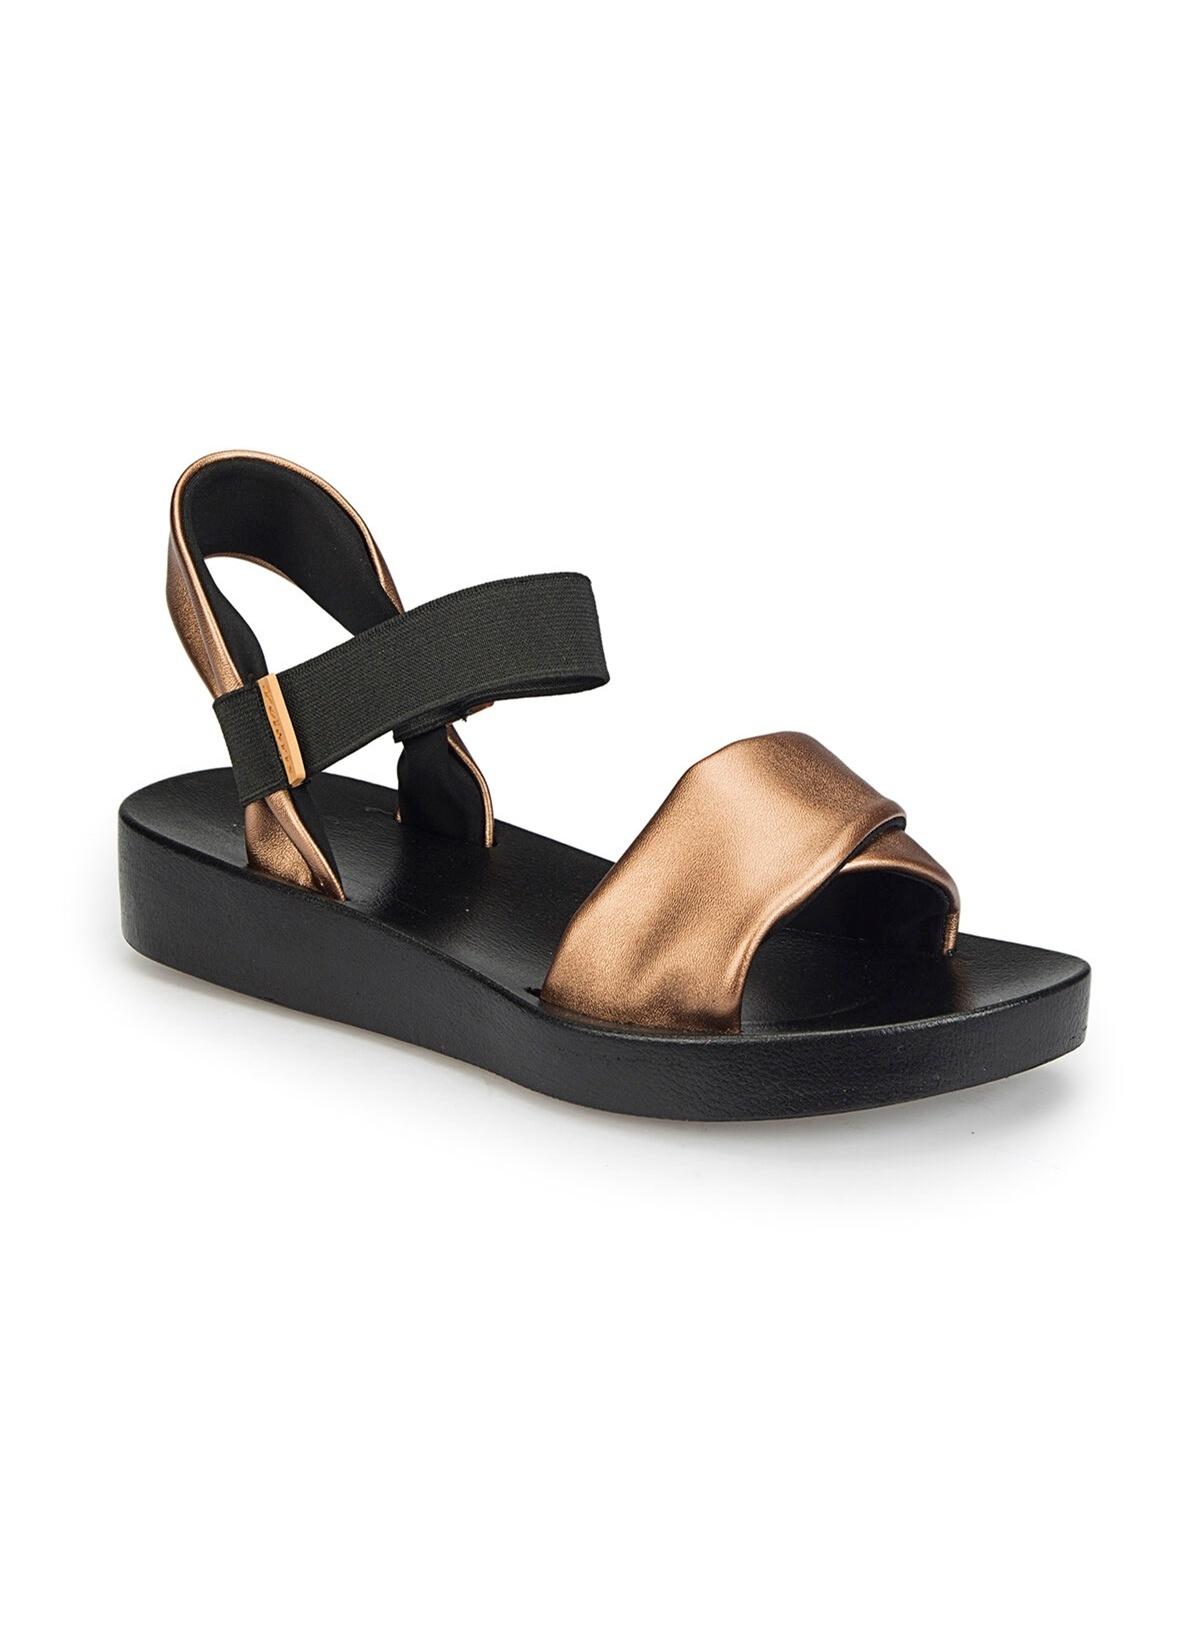 Polaris Sandalet 81.158694.z Basic Comfort – 69.99 TL